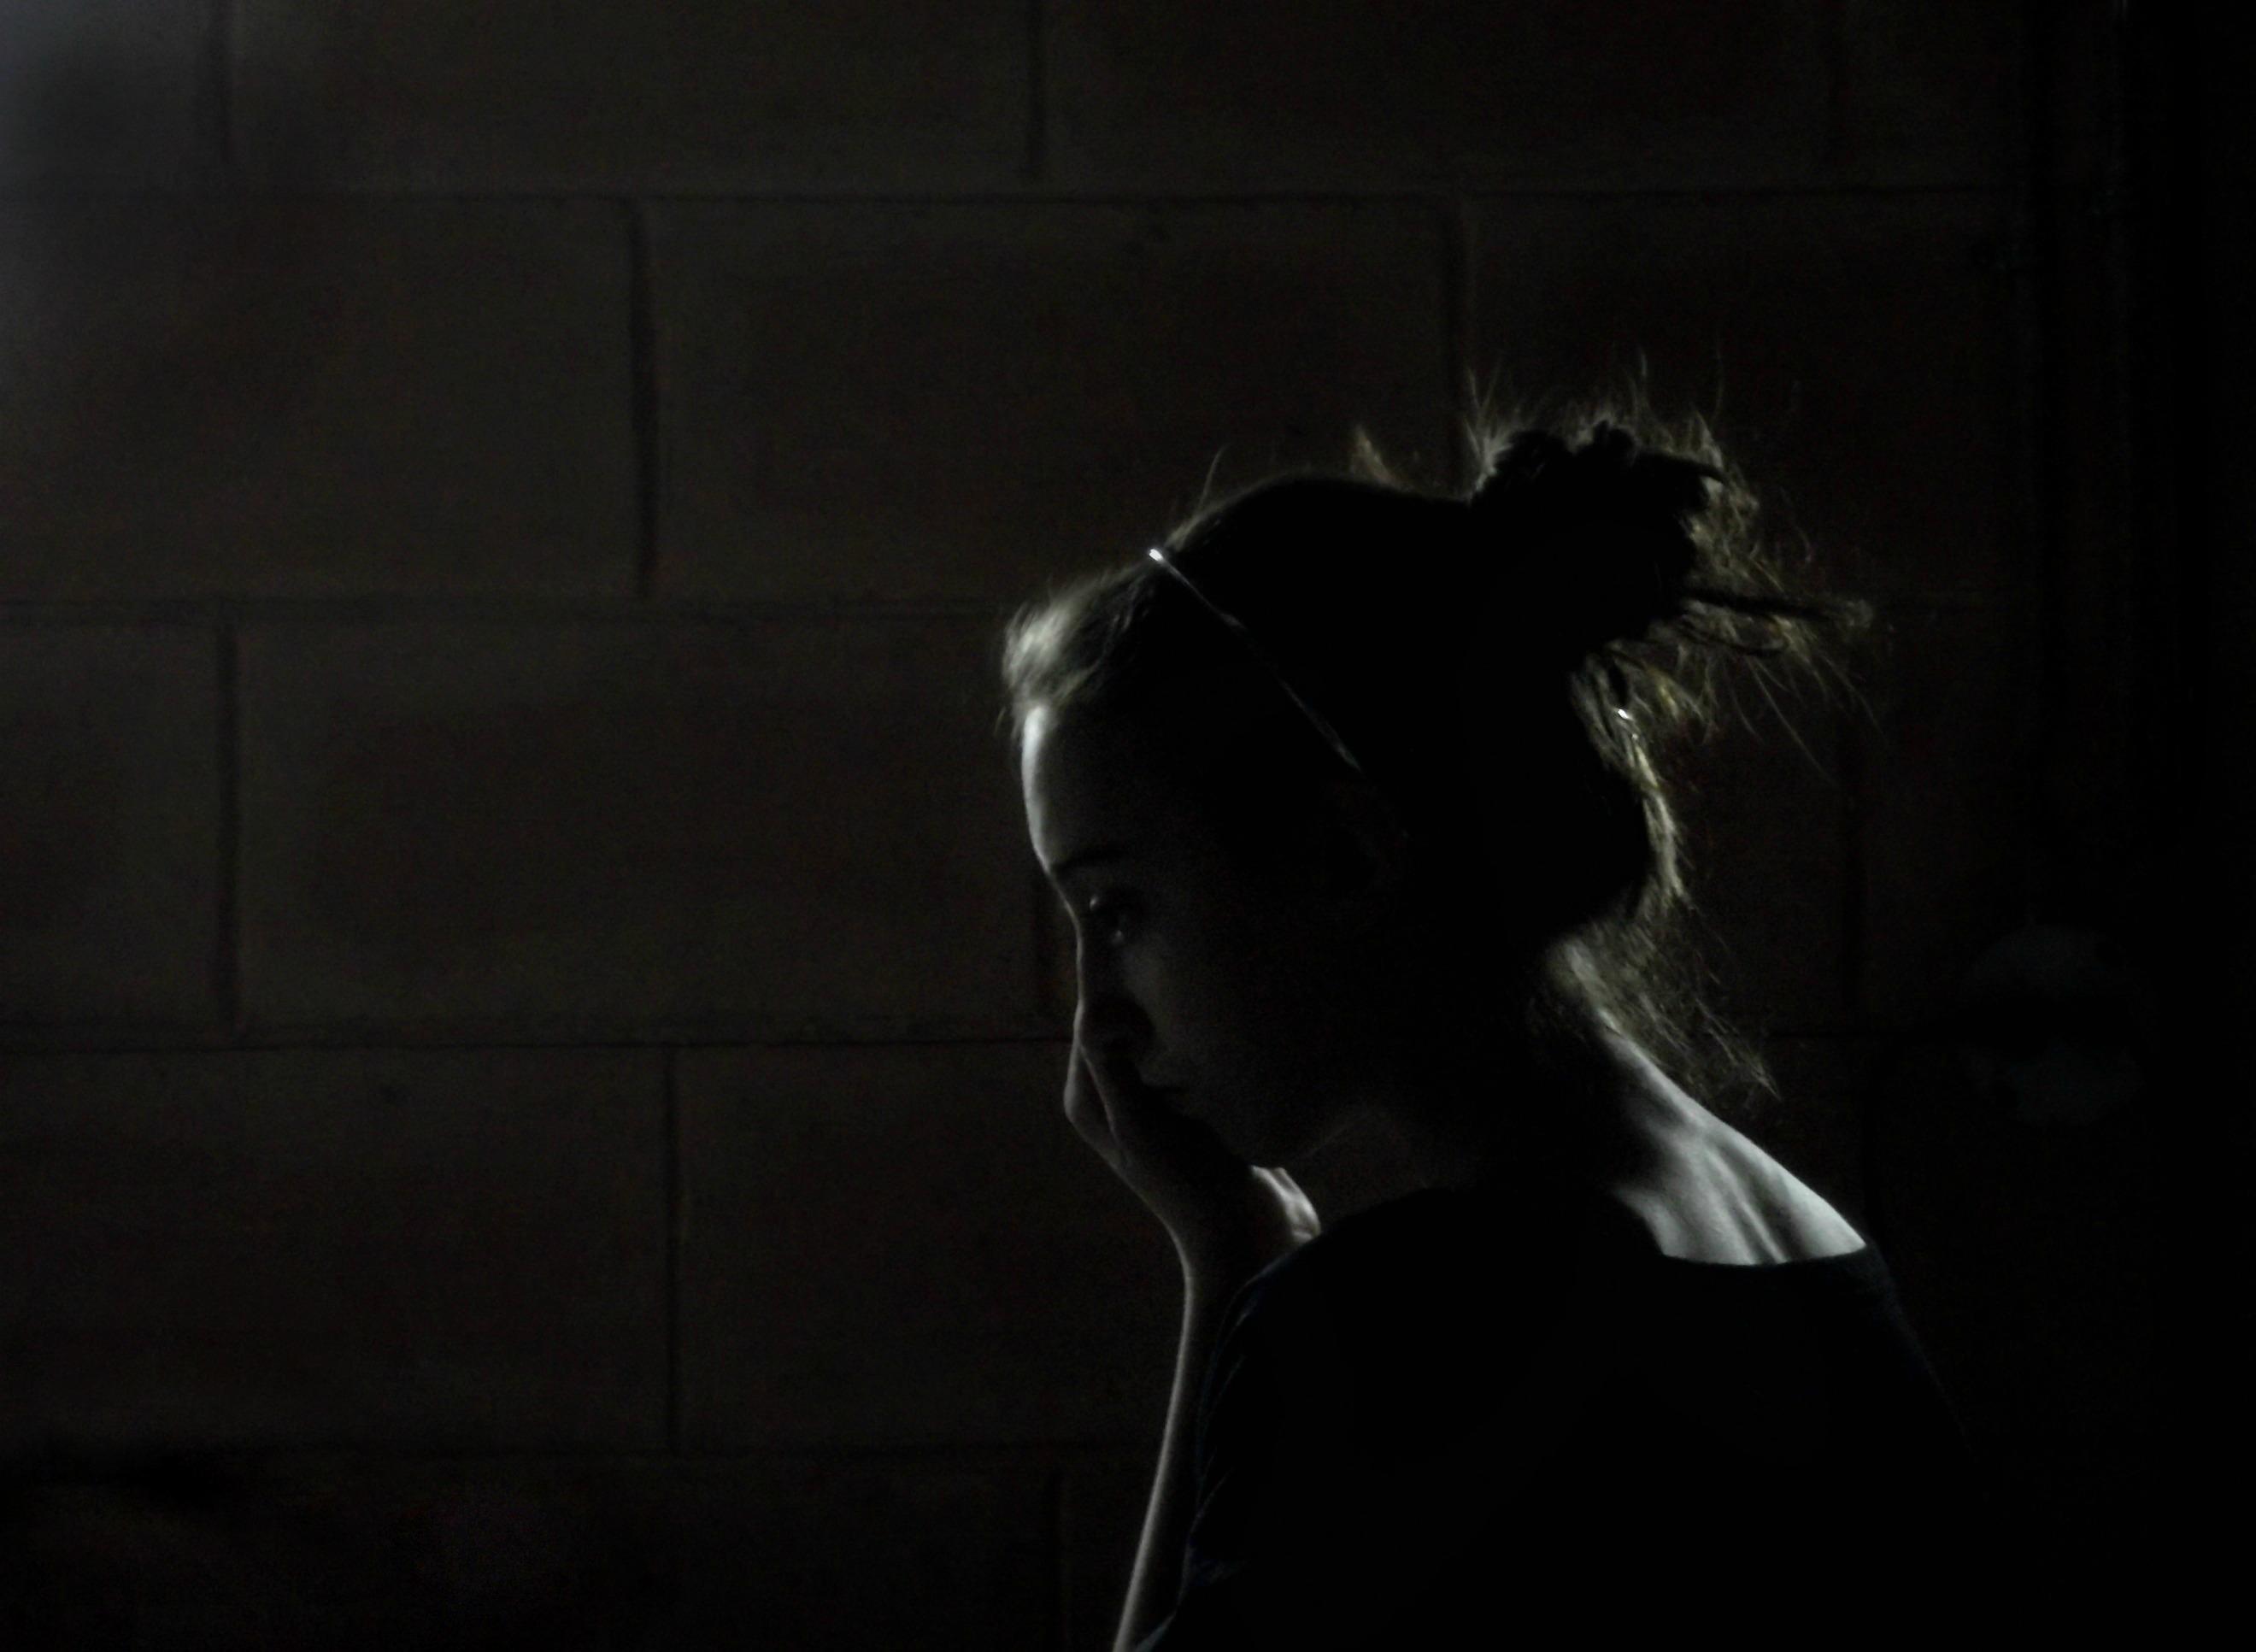 dark basement hd. Light Brick Leave Me Girl Dark Hair Back Alone Basement Hd